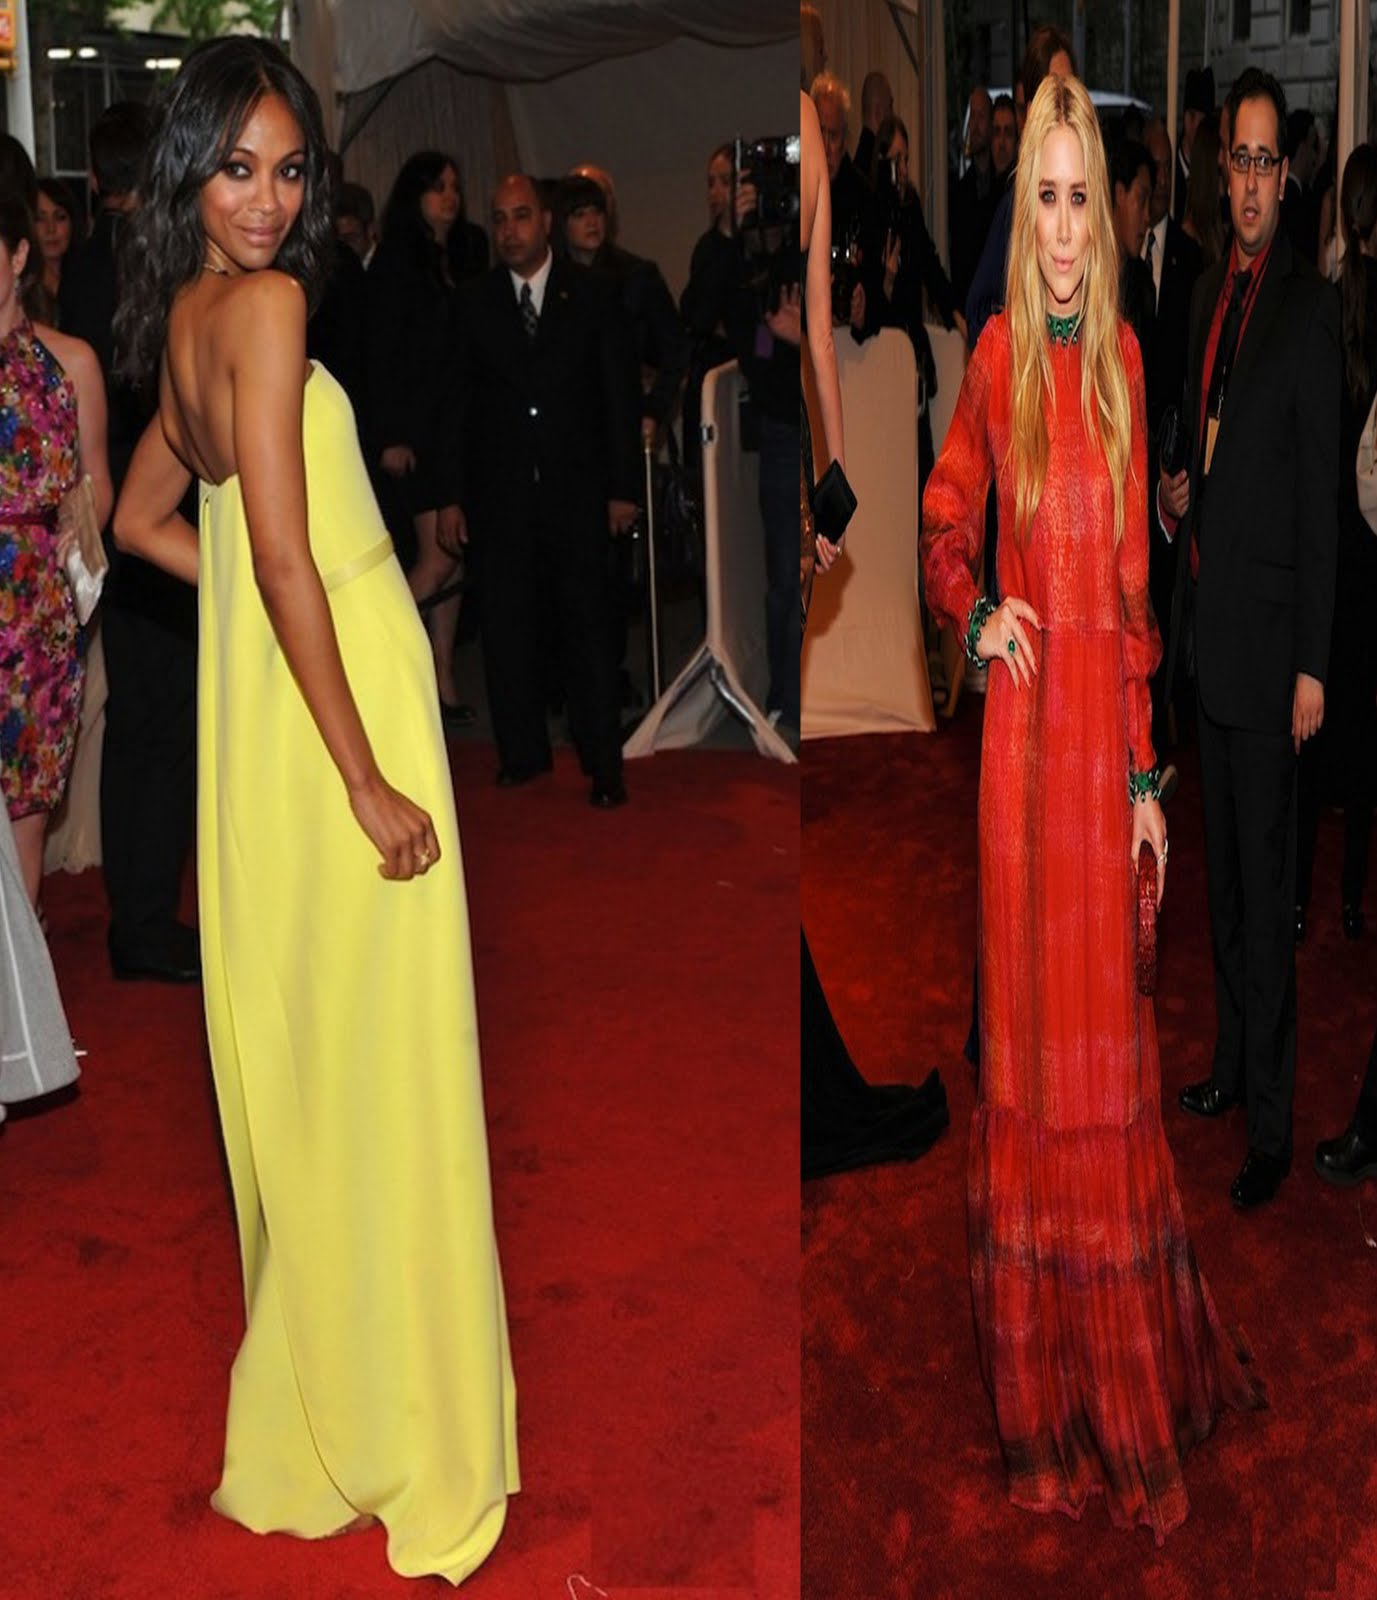 http://3.bp.blogspot.com/-0Yo8Fb_8ZDc/TcB3dQjZ5yI/AAAAAAAAD8Q/InSVMoDRz_8/s1600/Met+2011+by+jadore-fashion.jpg